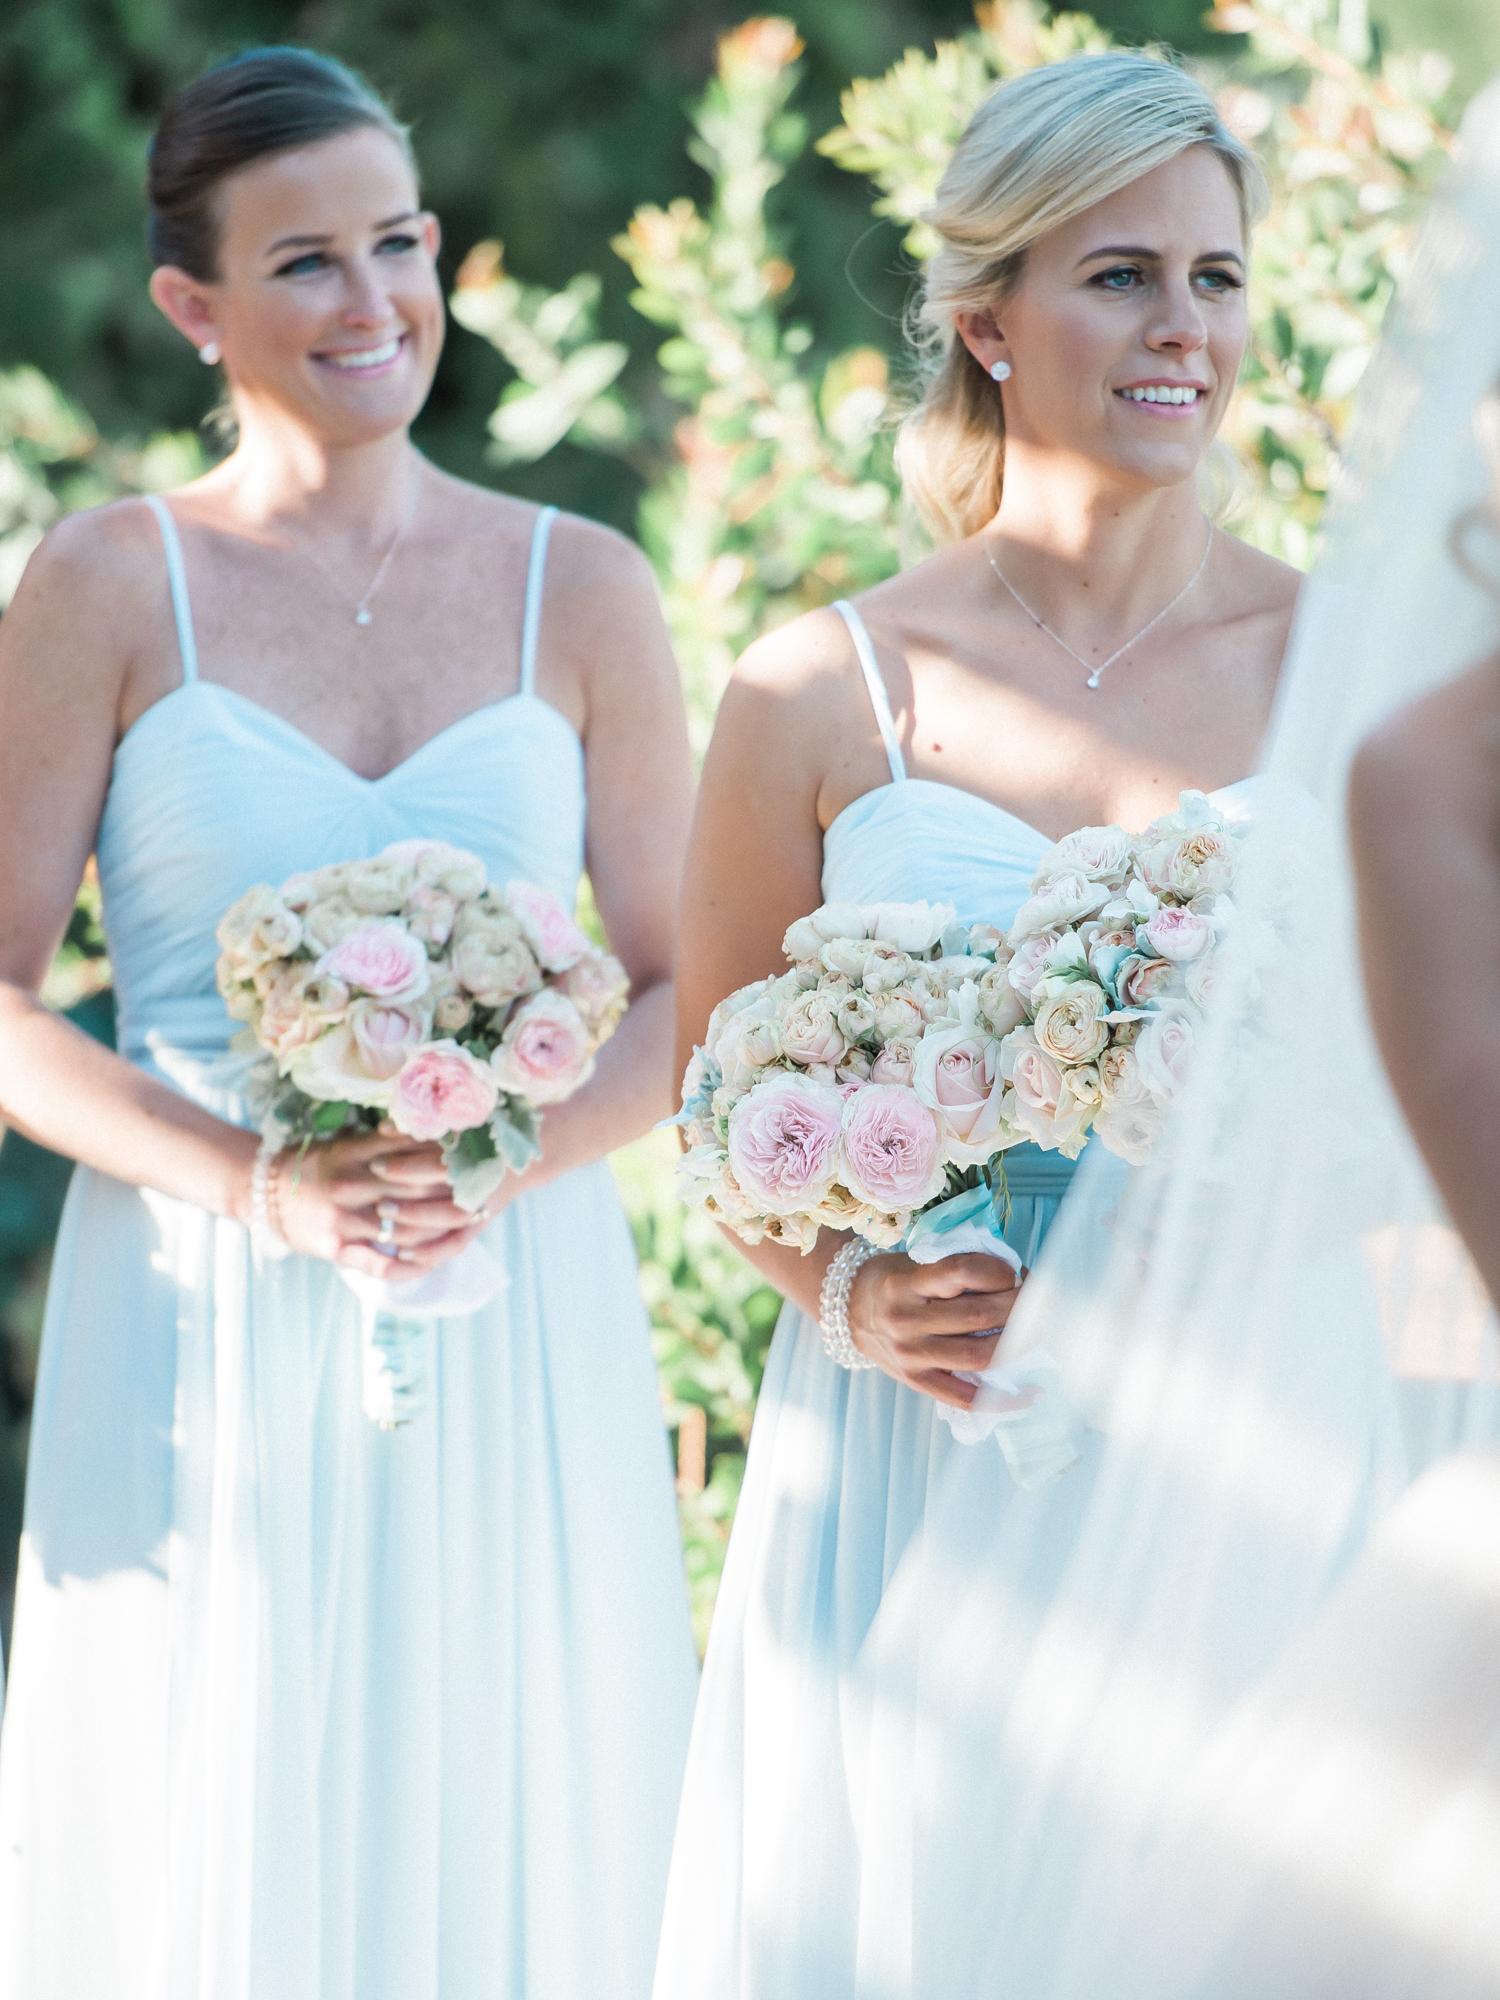 Aimee+Logan_wedding_spp-93.jpg